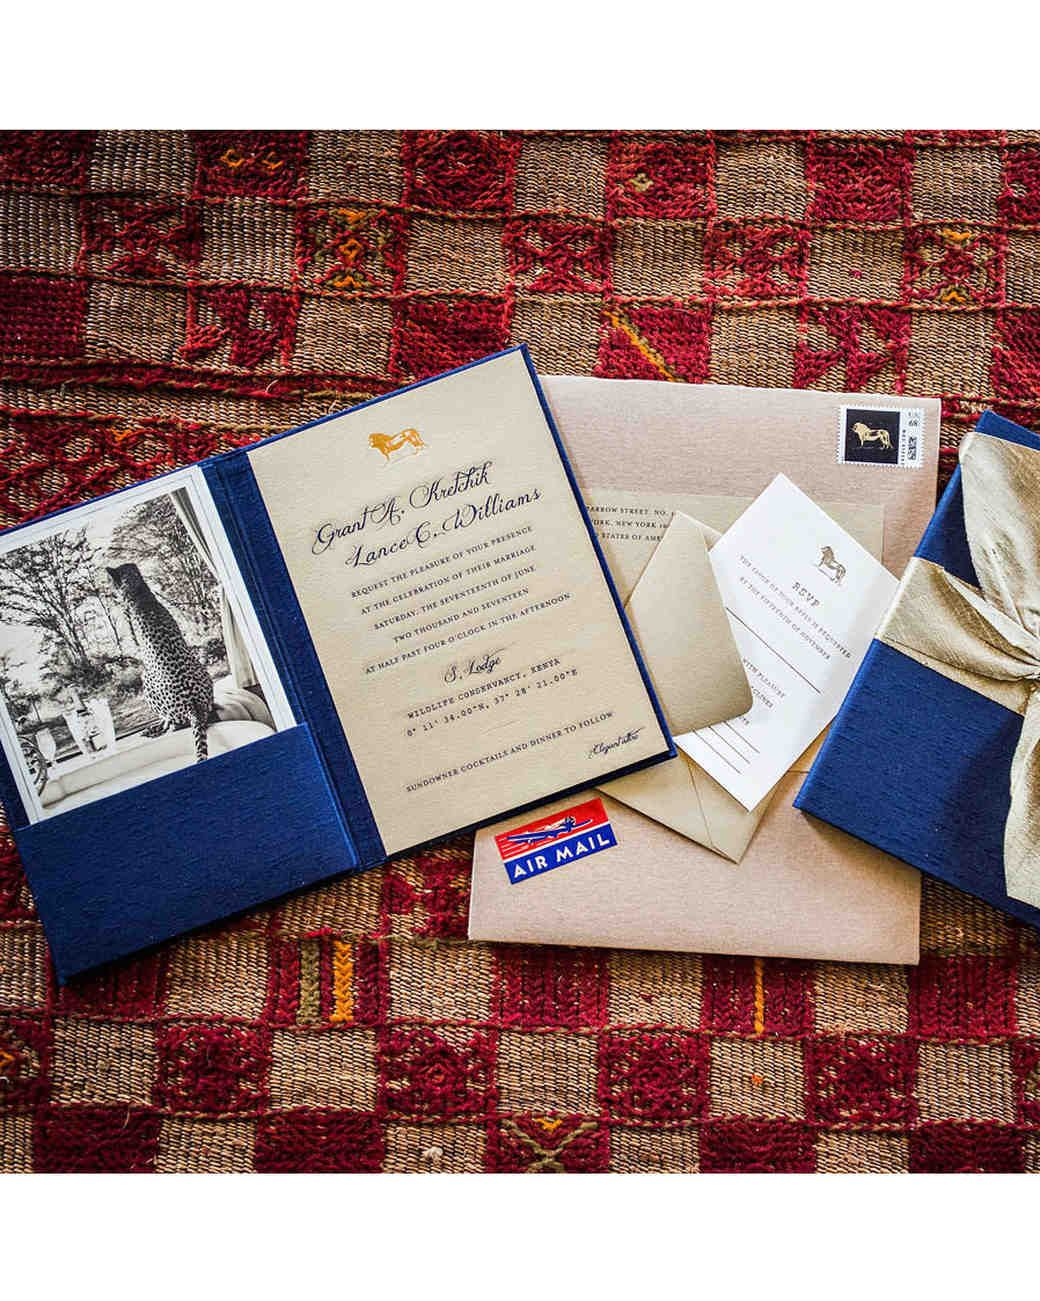 29 Ideas for Unique Wedding Invitations | Unique wedding invitation ...